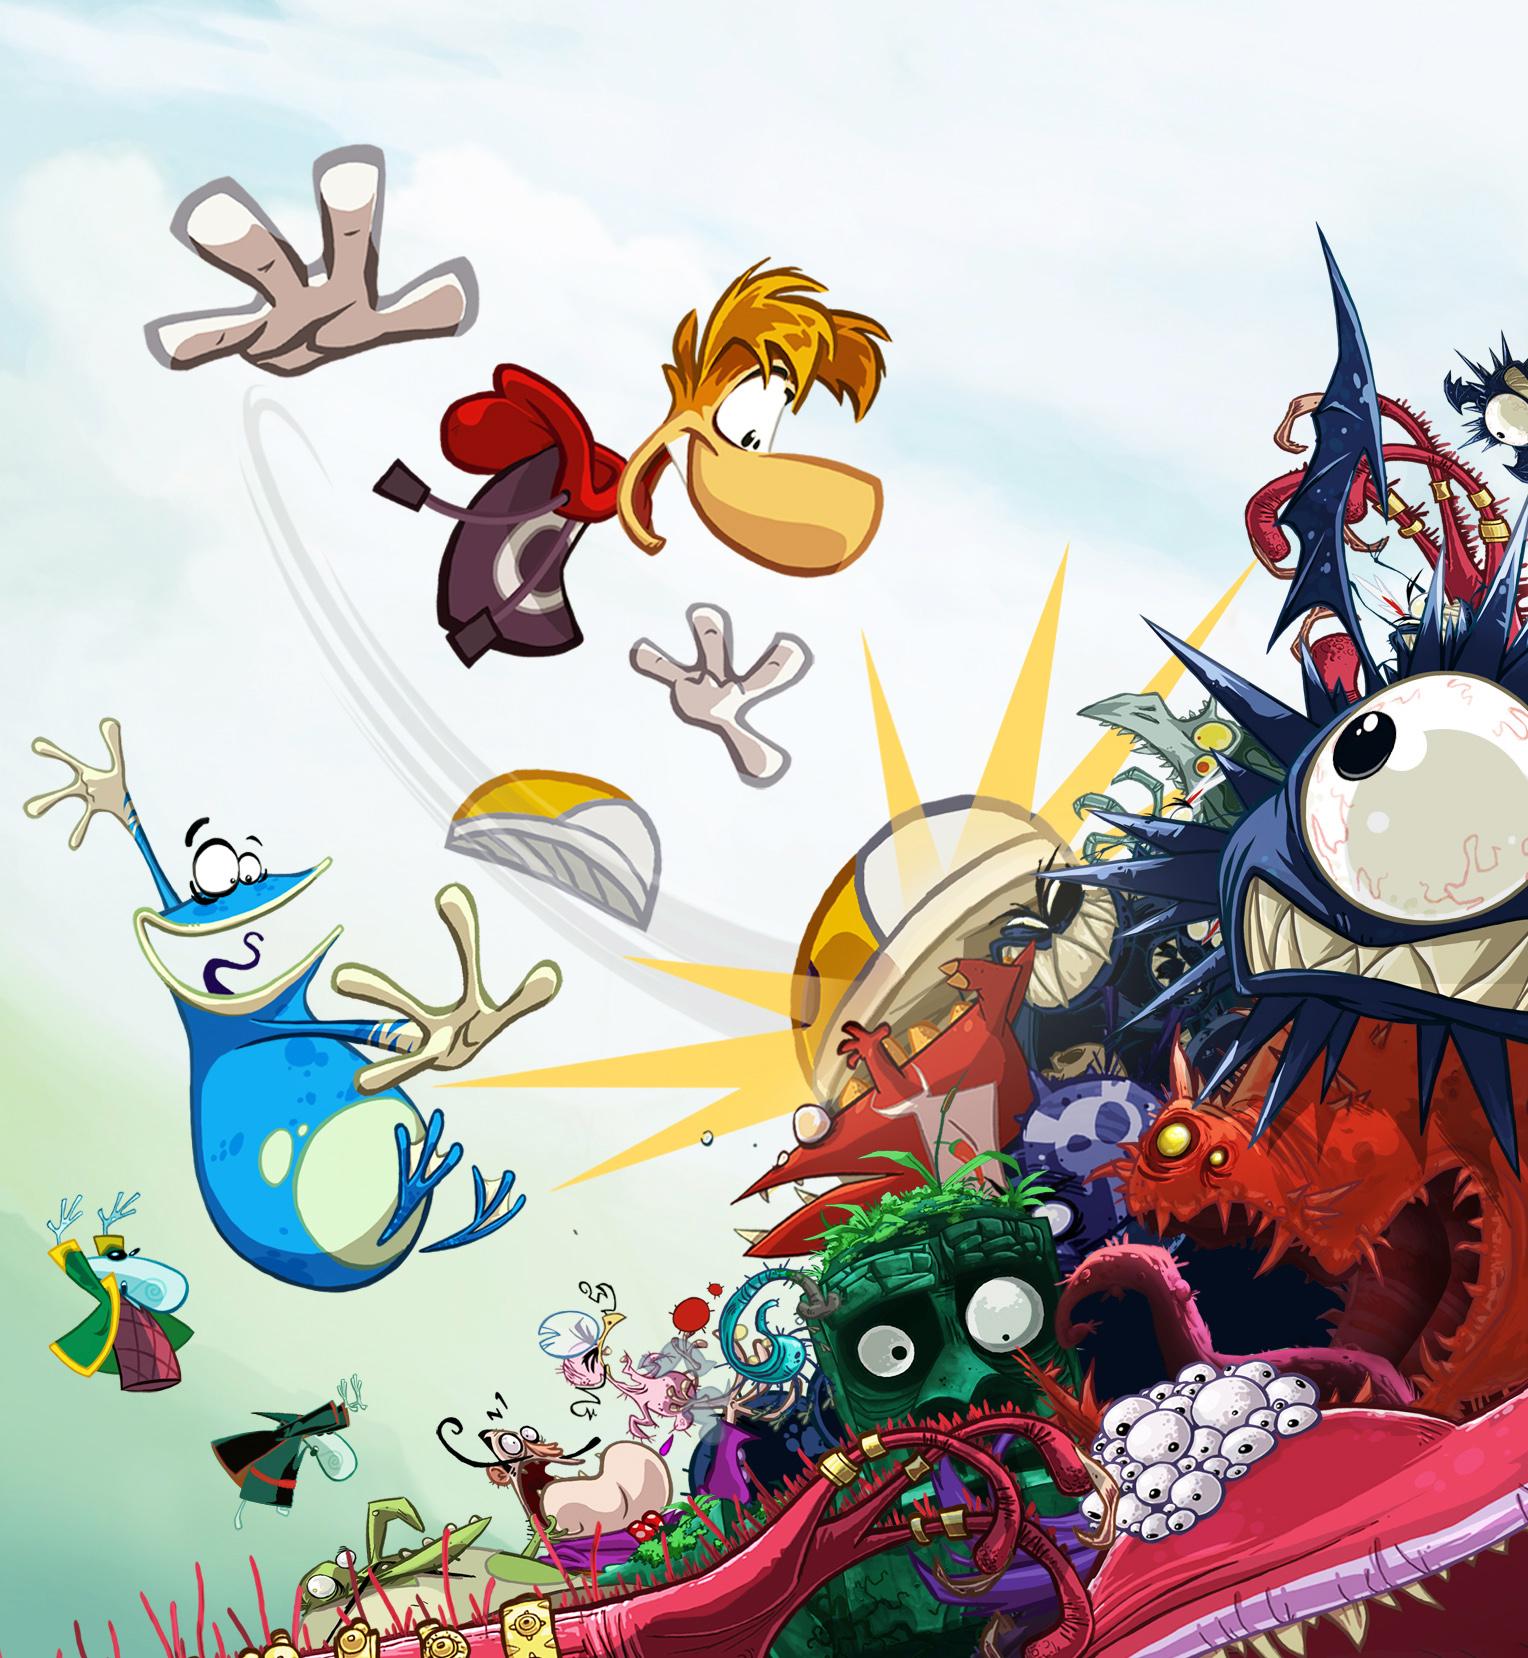 http://terminalgamer.com/wp-content/uploads/2011/06/Rayman_Origins_KeyArt.jpg